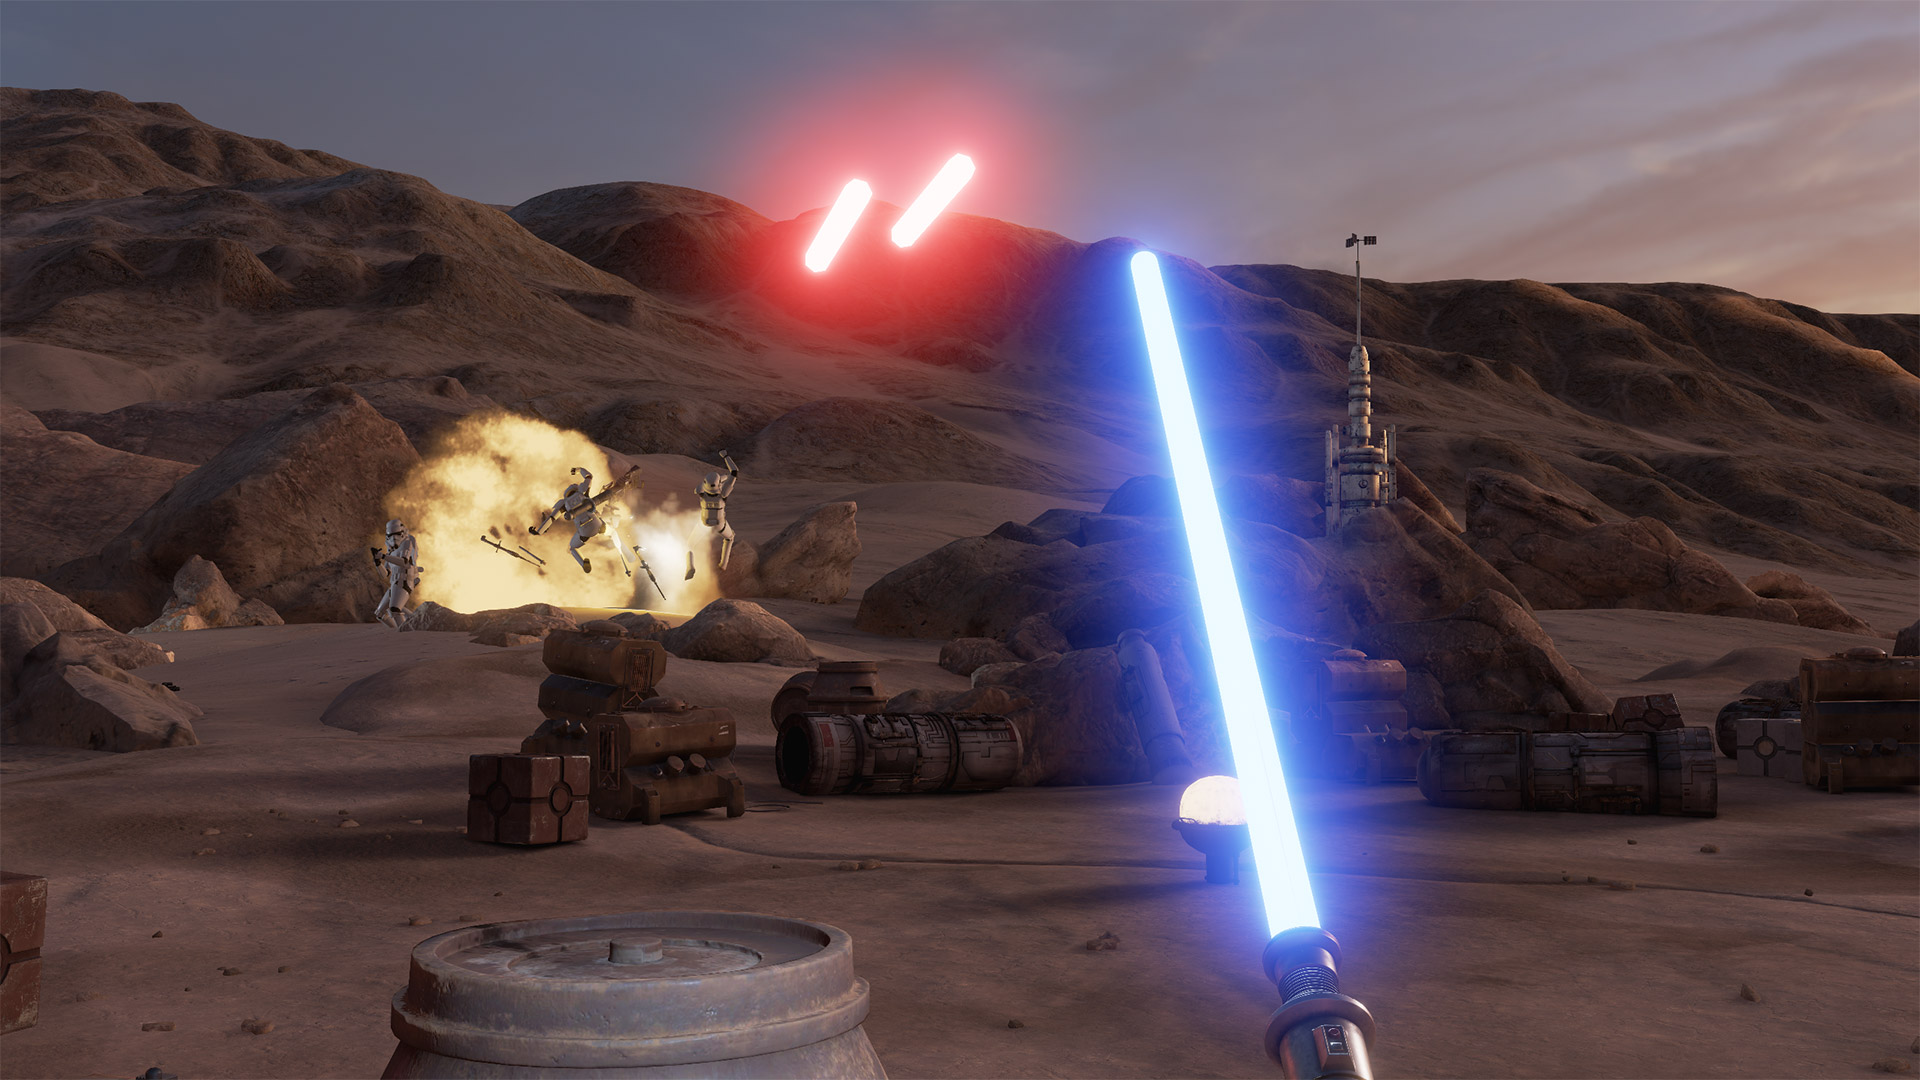 star-wars-trials-of-tatooine-virtual-reality-htc-vive-vr-lightsaber.jpg